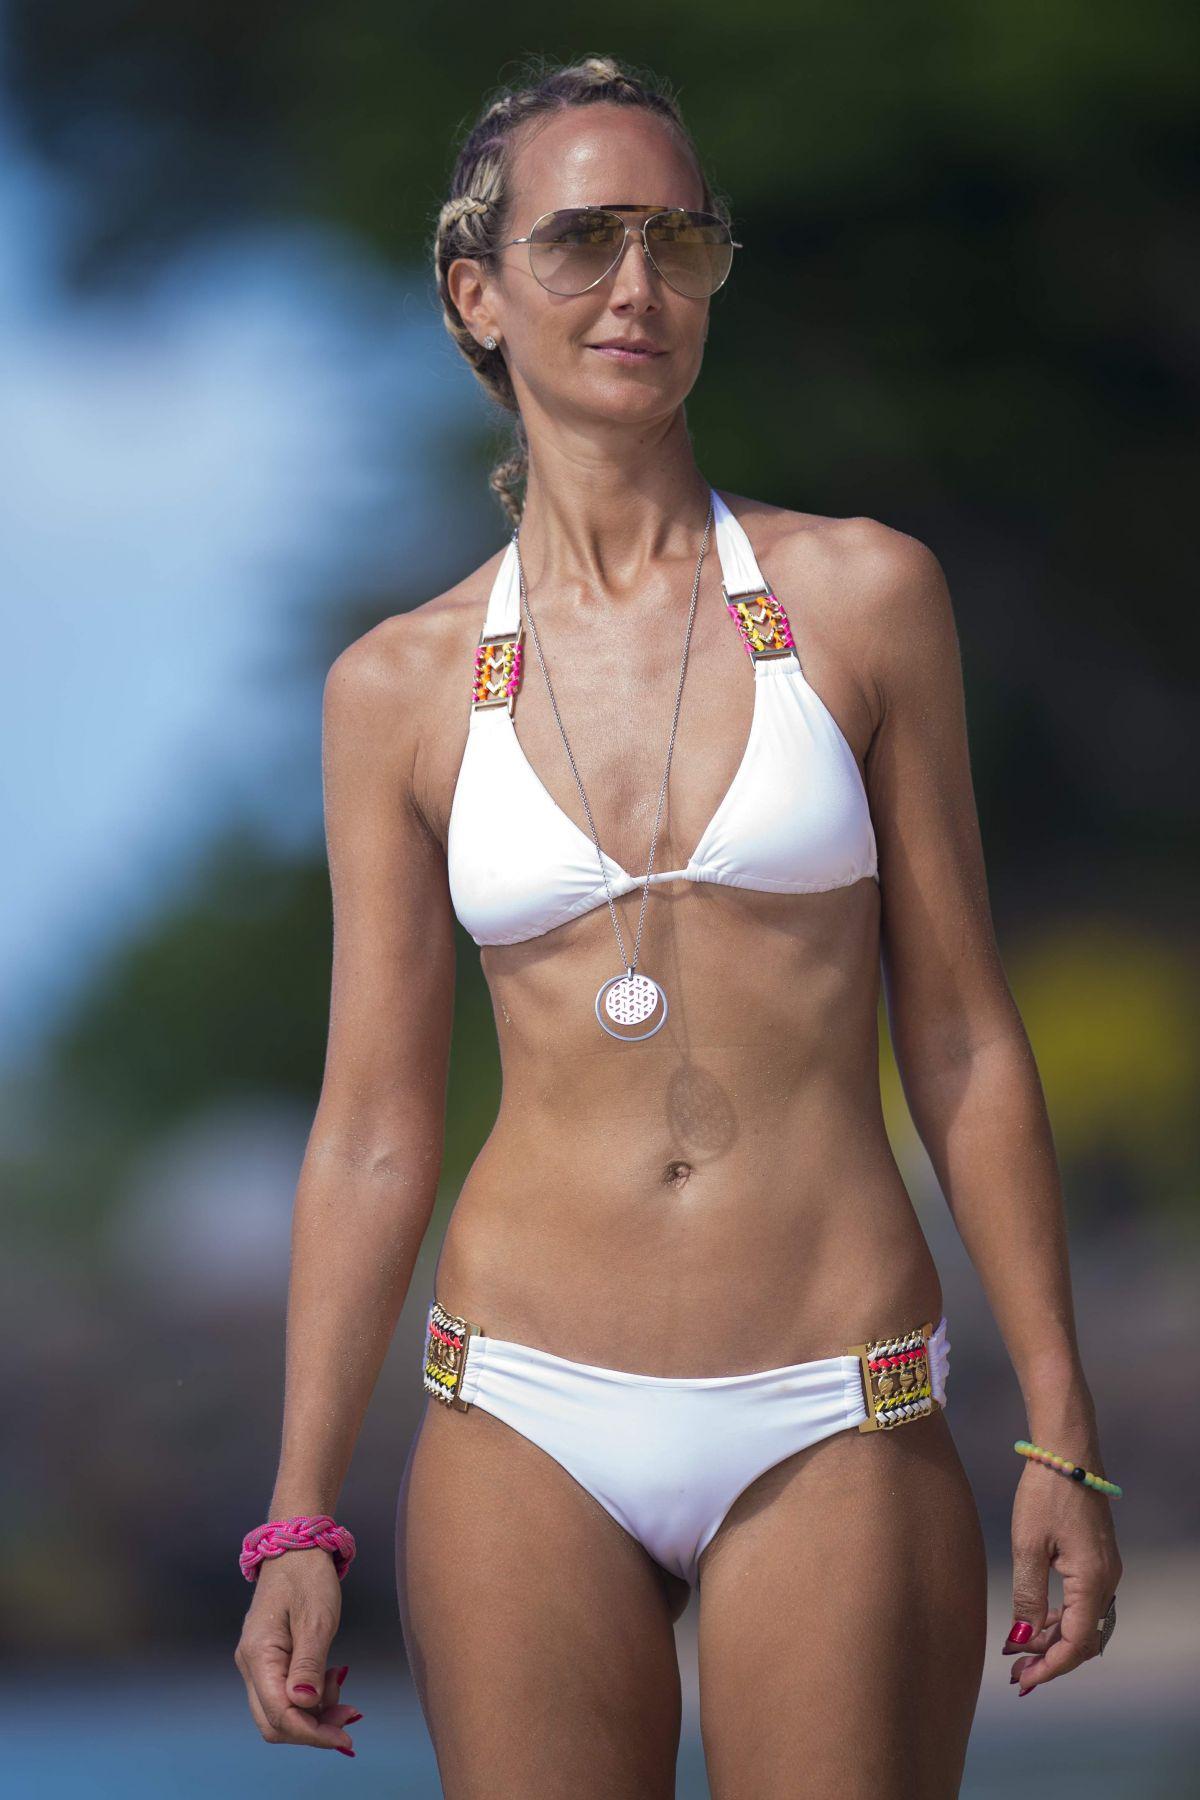 Bikini Victoria Hervey nude (87 photos), Paparazzi